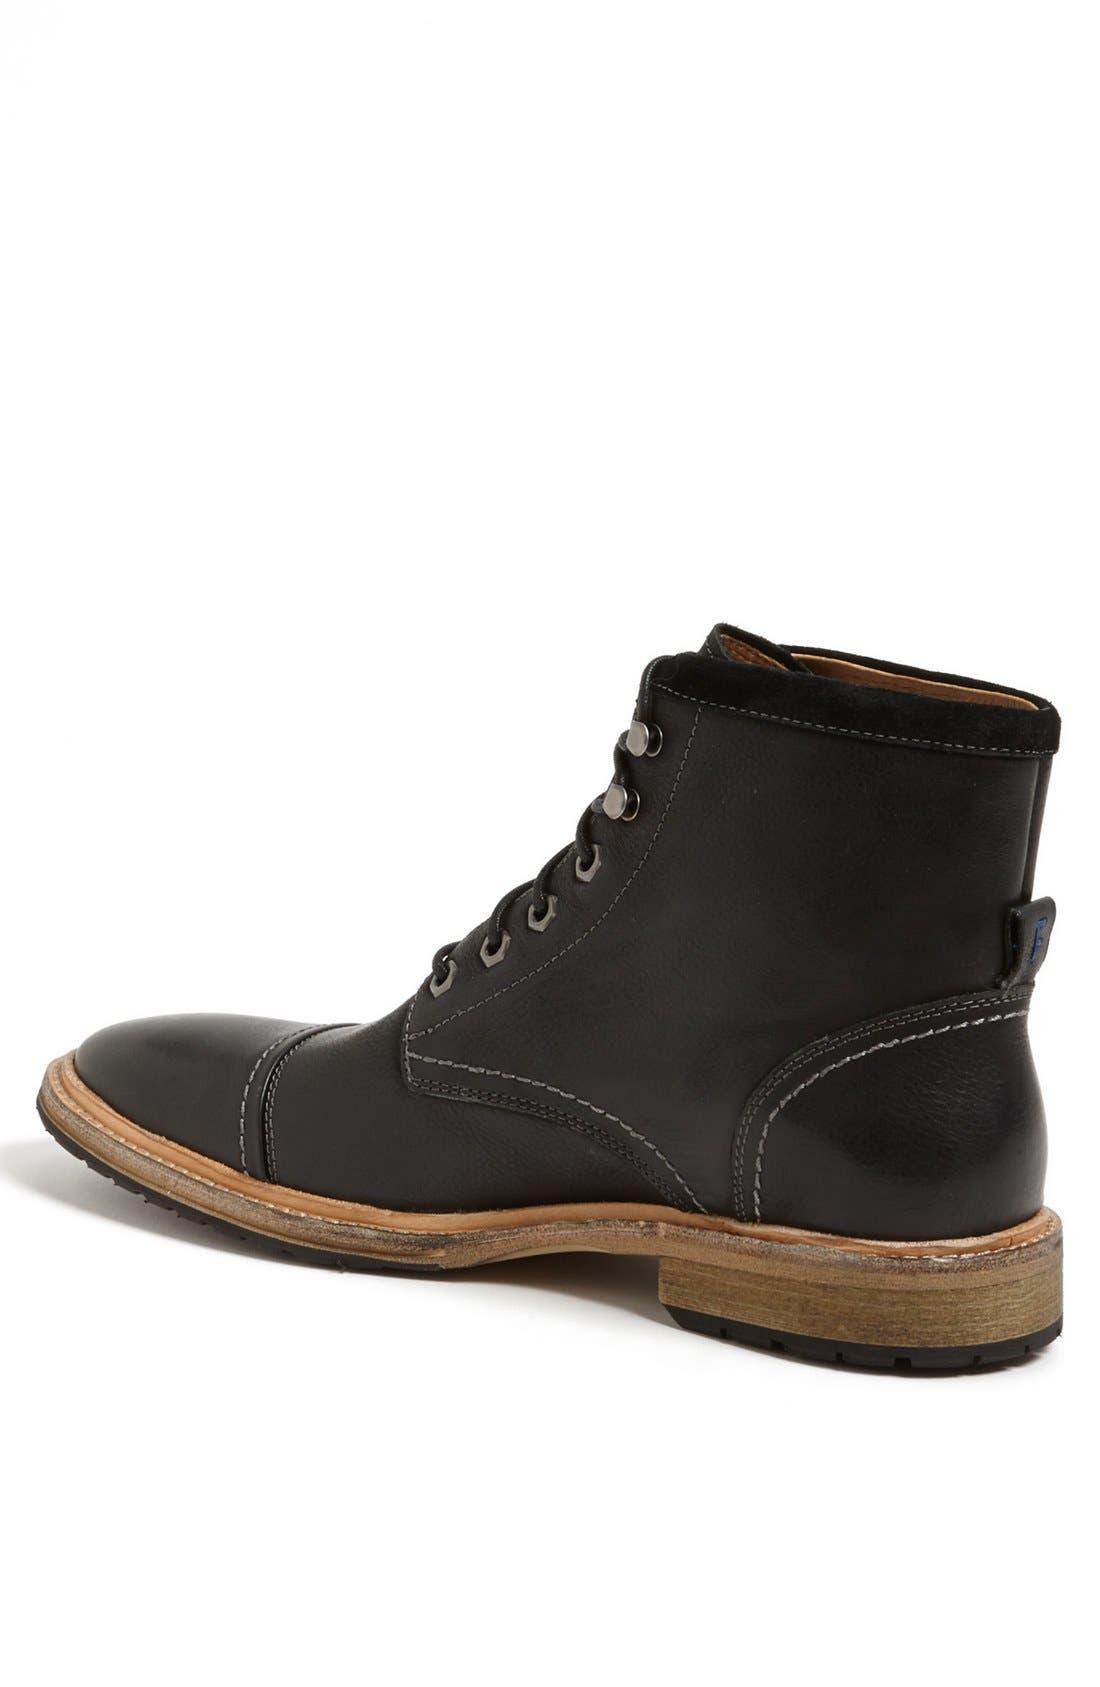 'Indie' Cap Toe Boot,                             Alternate thumbnail 2, color,                             Black